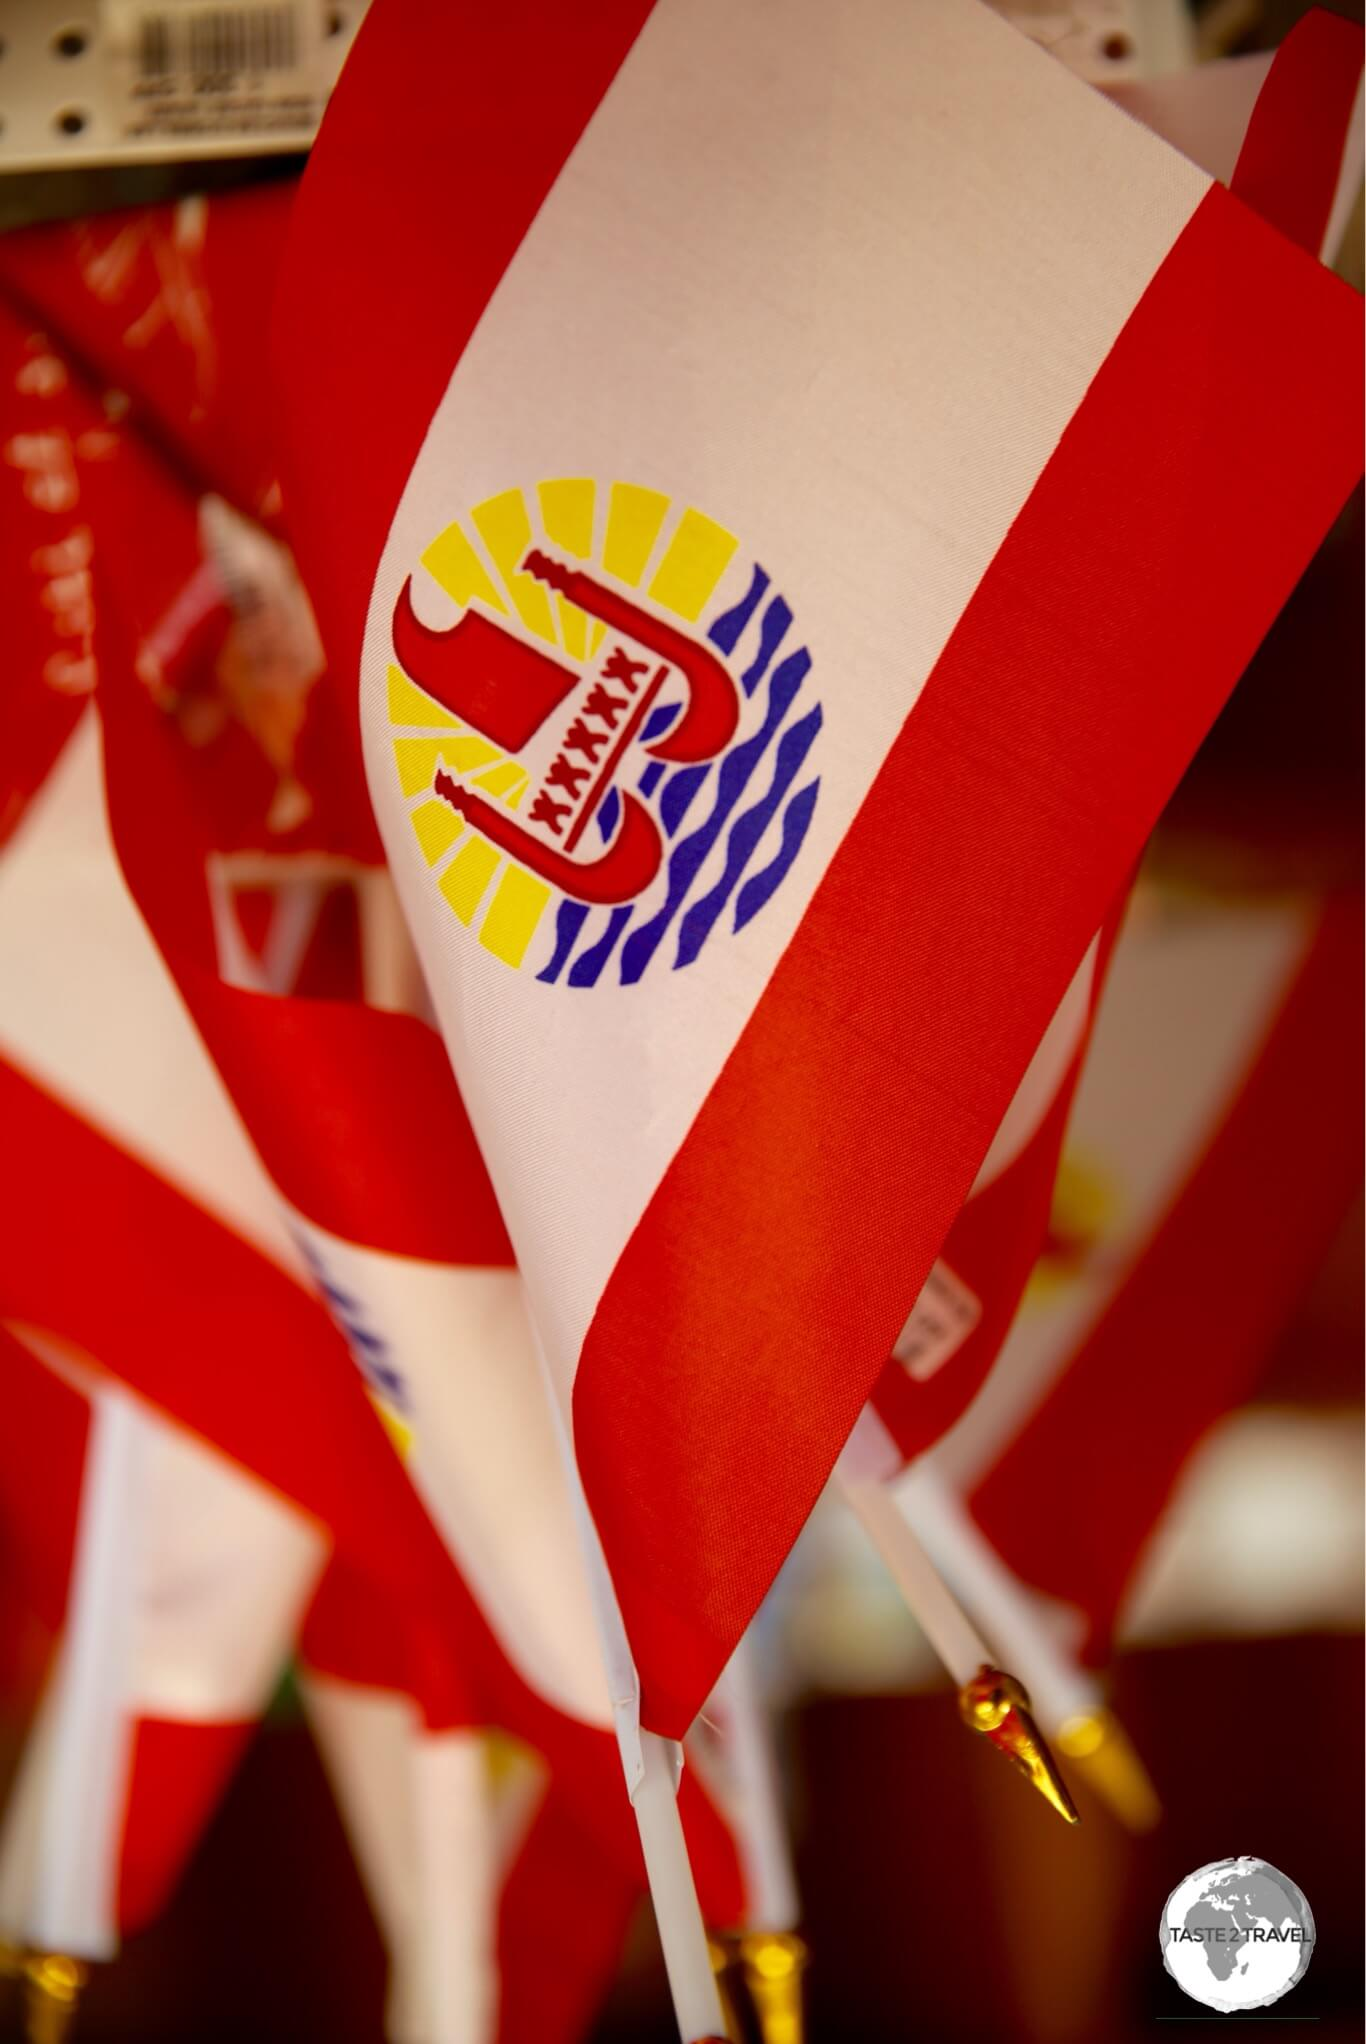 The flag of French Polynesia.